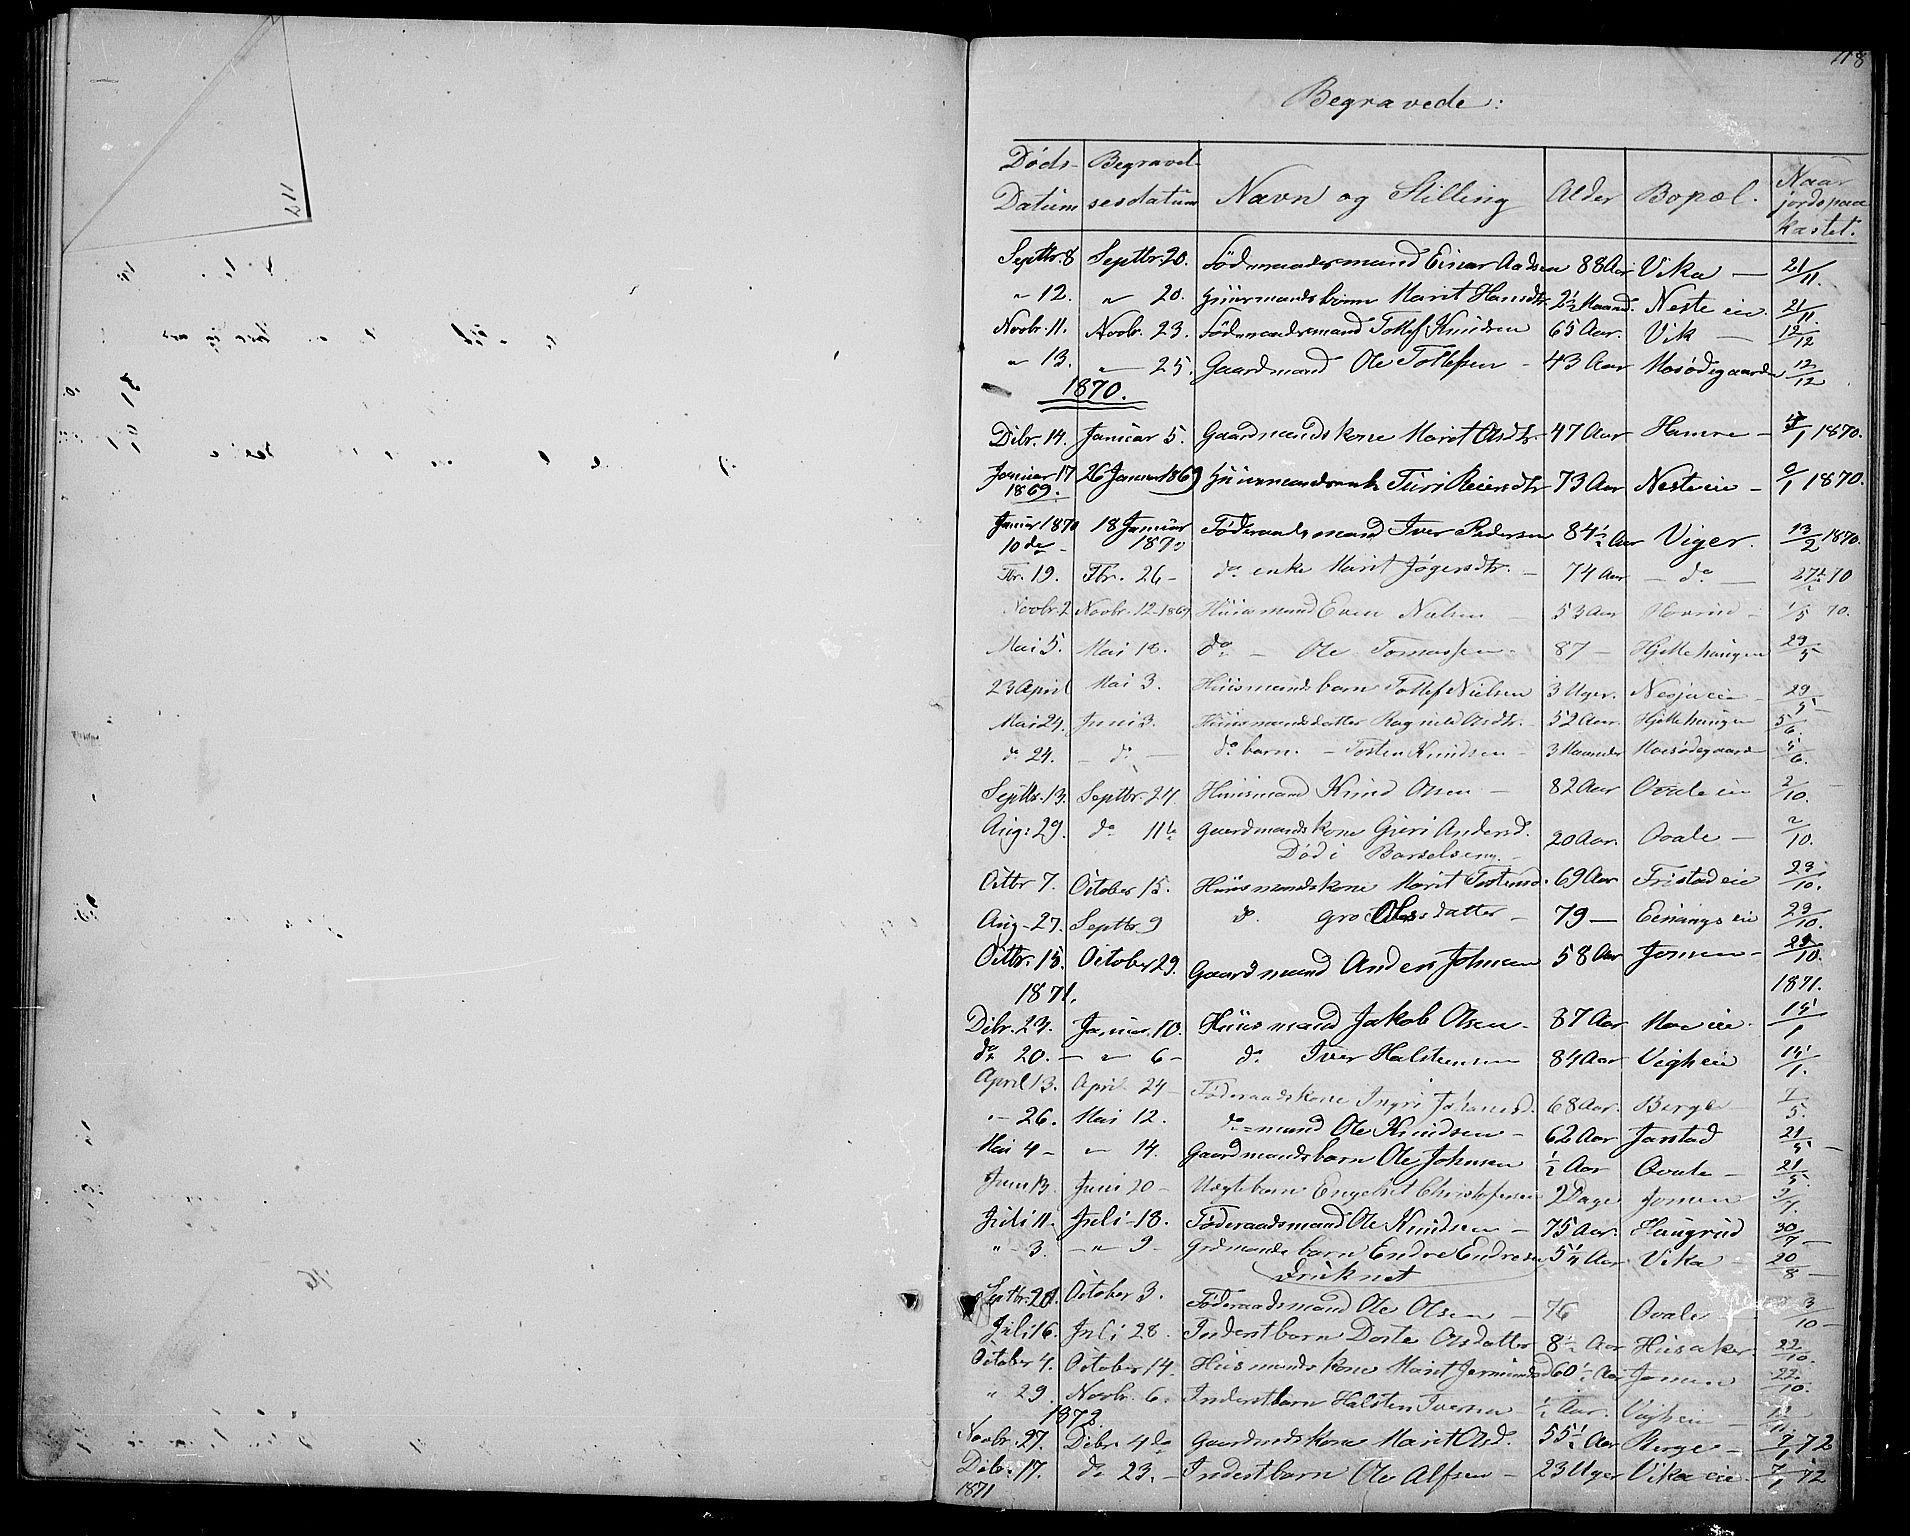 SAH, Vestre Slidre prestekontor, Klokkerbok nr. 1, 1869-1882, s. 118